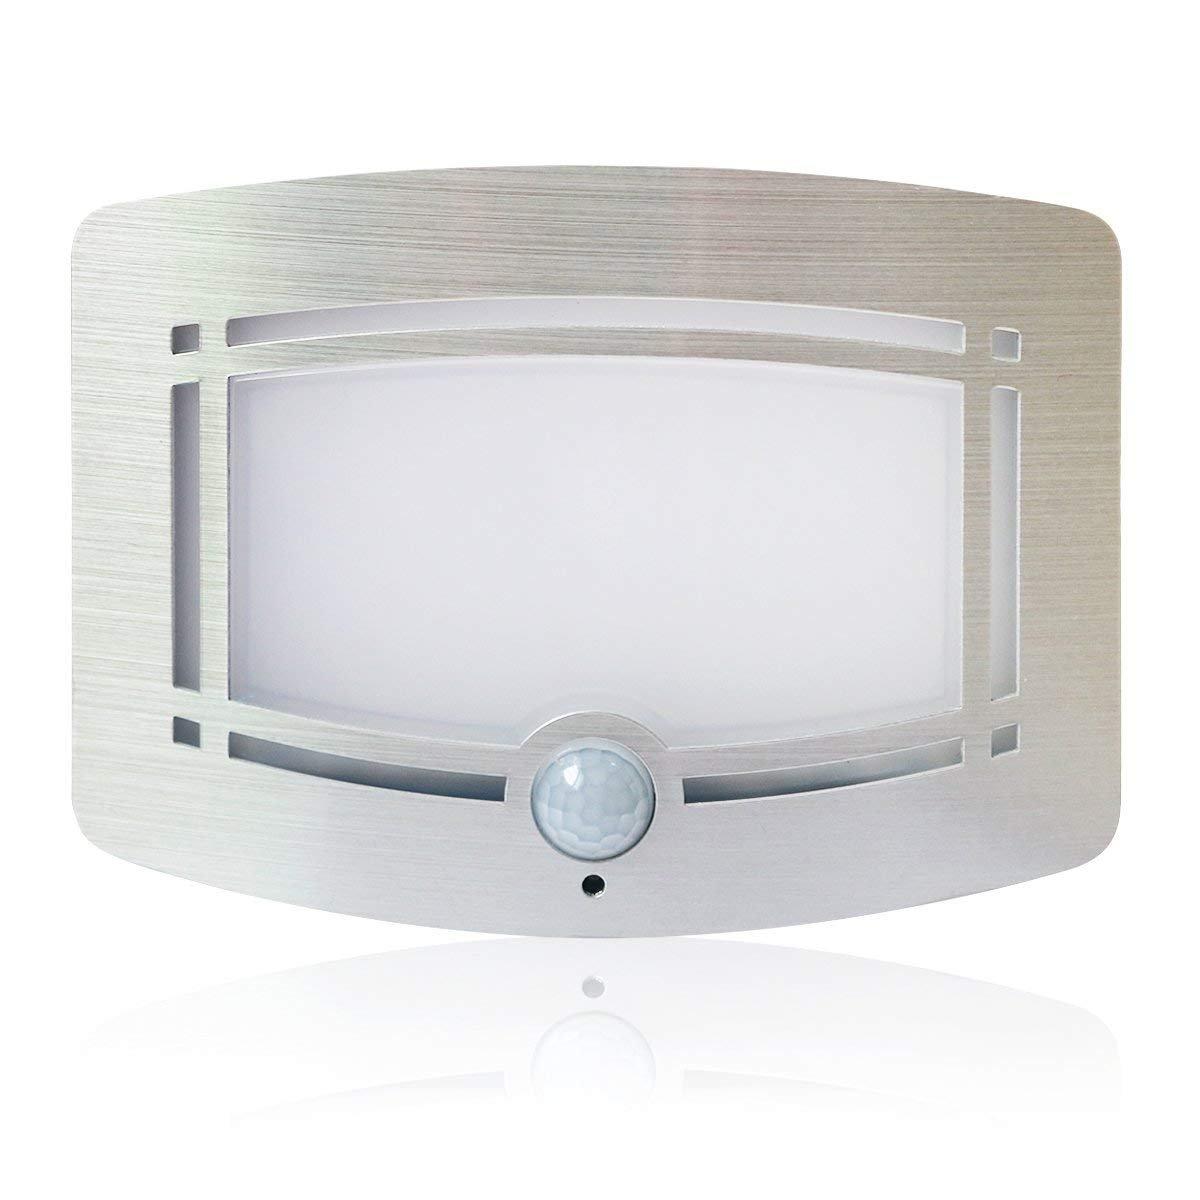 YWNC Wall Lamp LED Motion Sensor Body Induction Night Light Wireless Battery Powered Aluminum Case Closet Stair Hallway Bathroom Bedroom Kitchen Light,Warmwhite